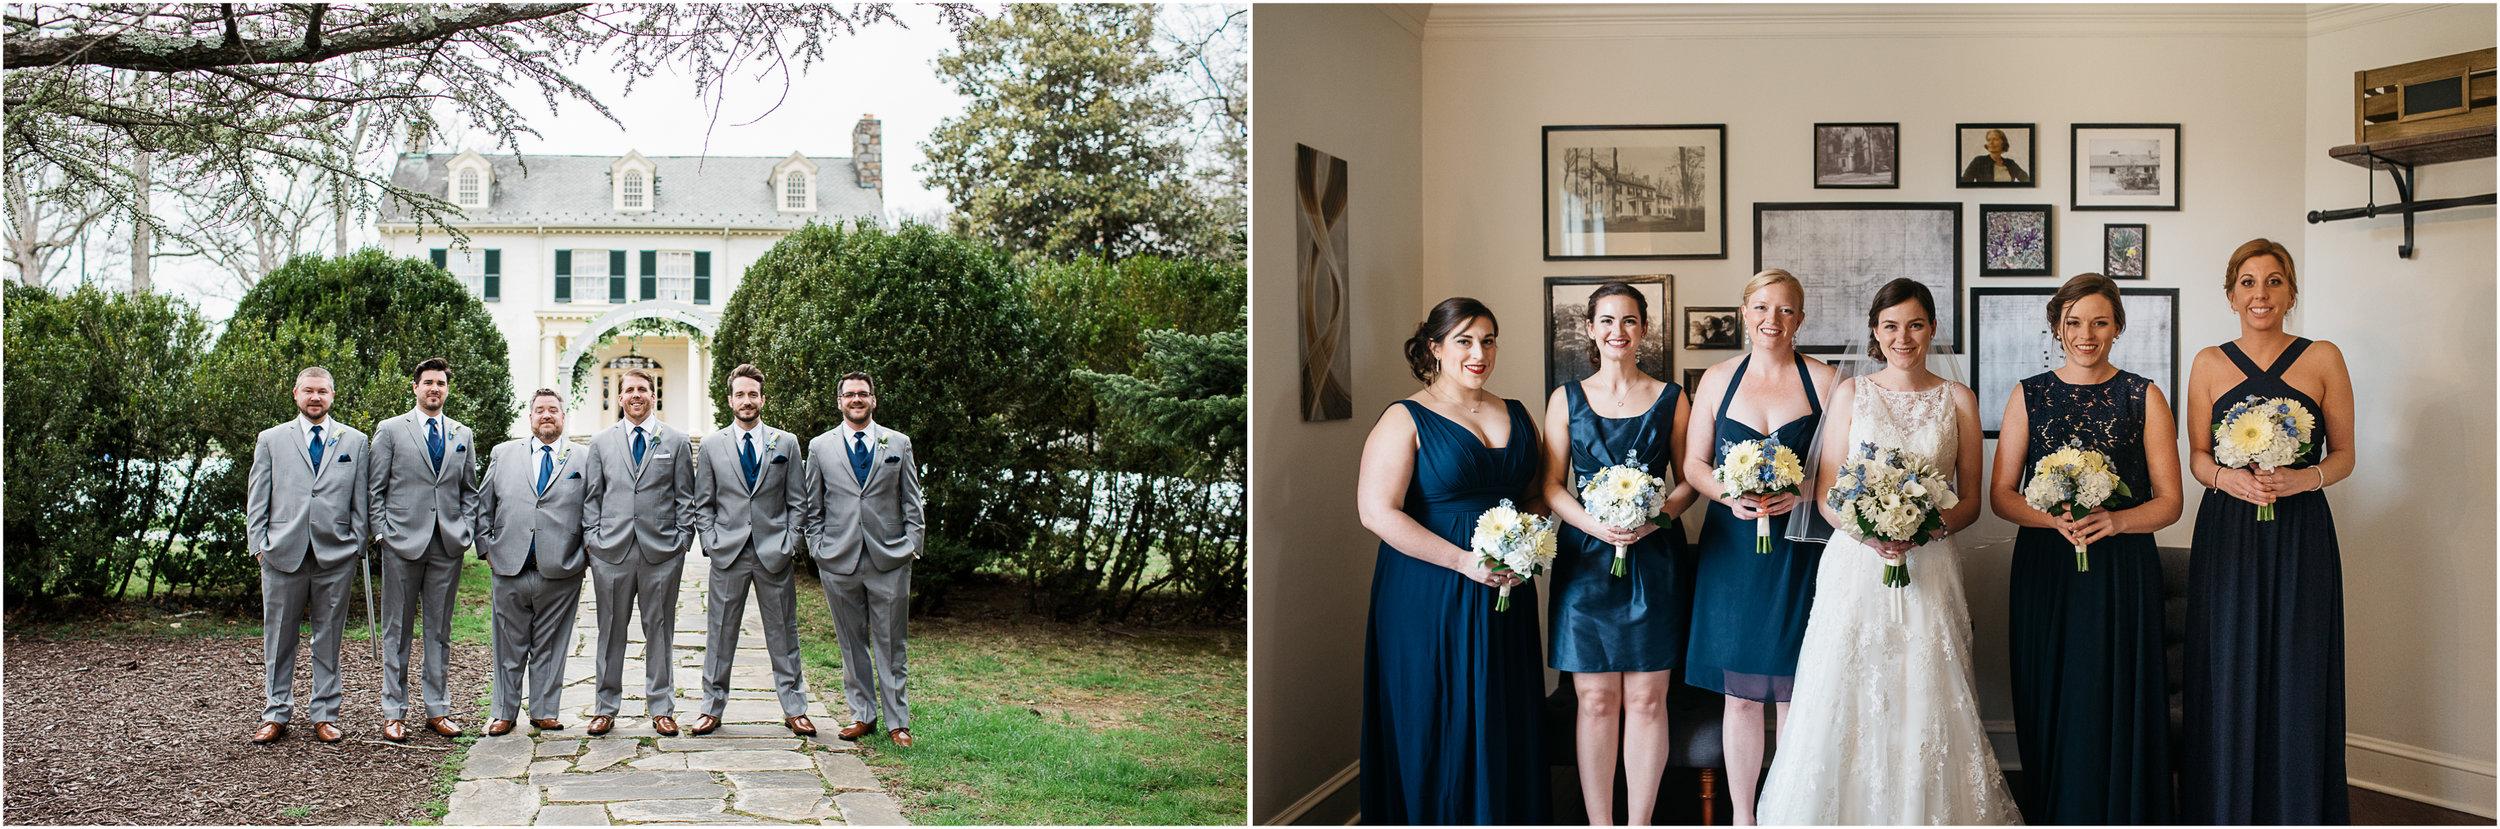 bridal party va wedding photographer rust manor weddings.jpg